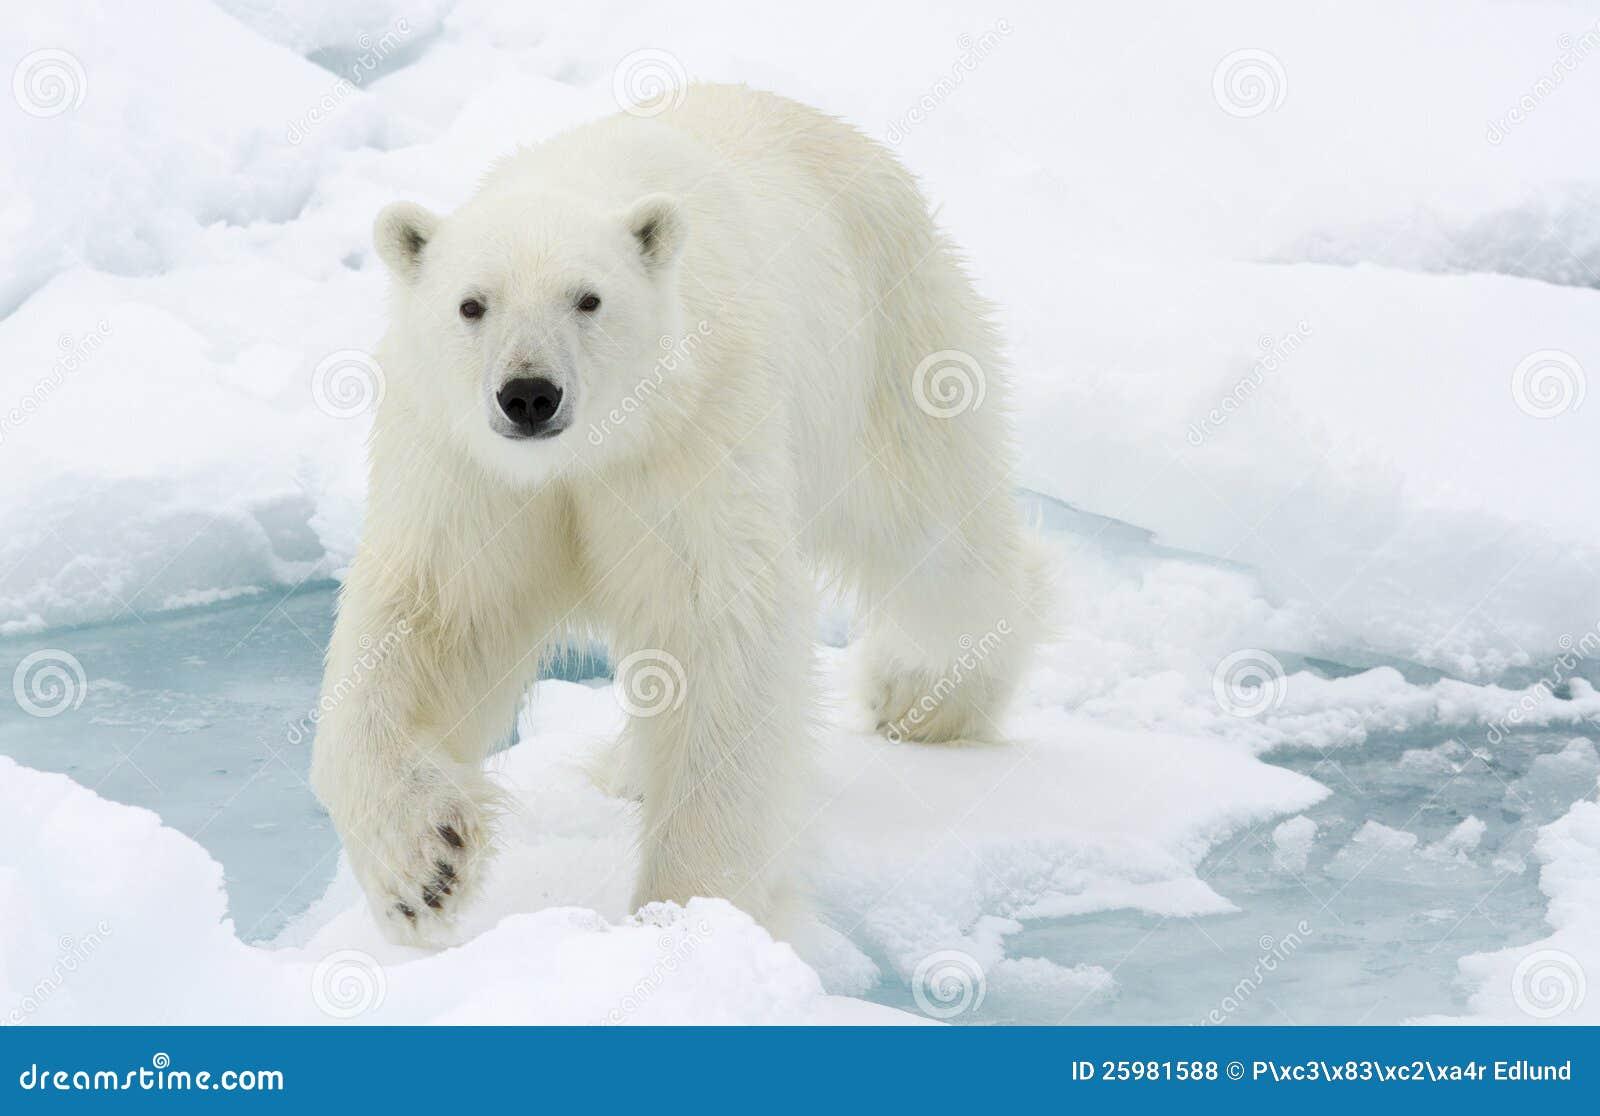 download北极熊照片地址.成都肿瘤医院库存狮子楼图片